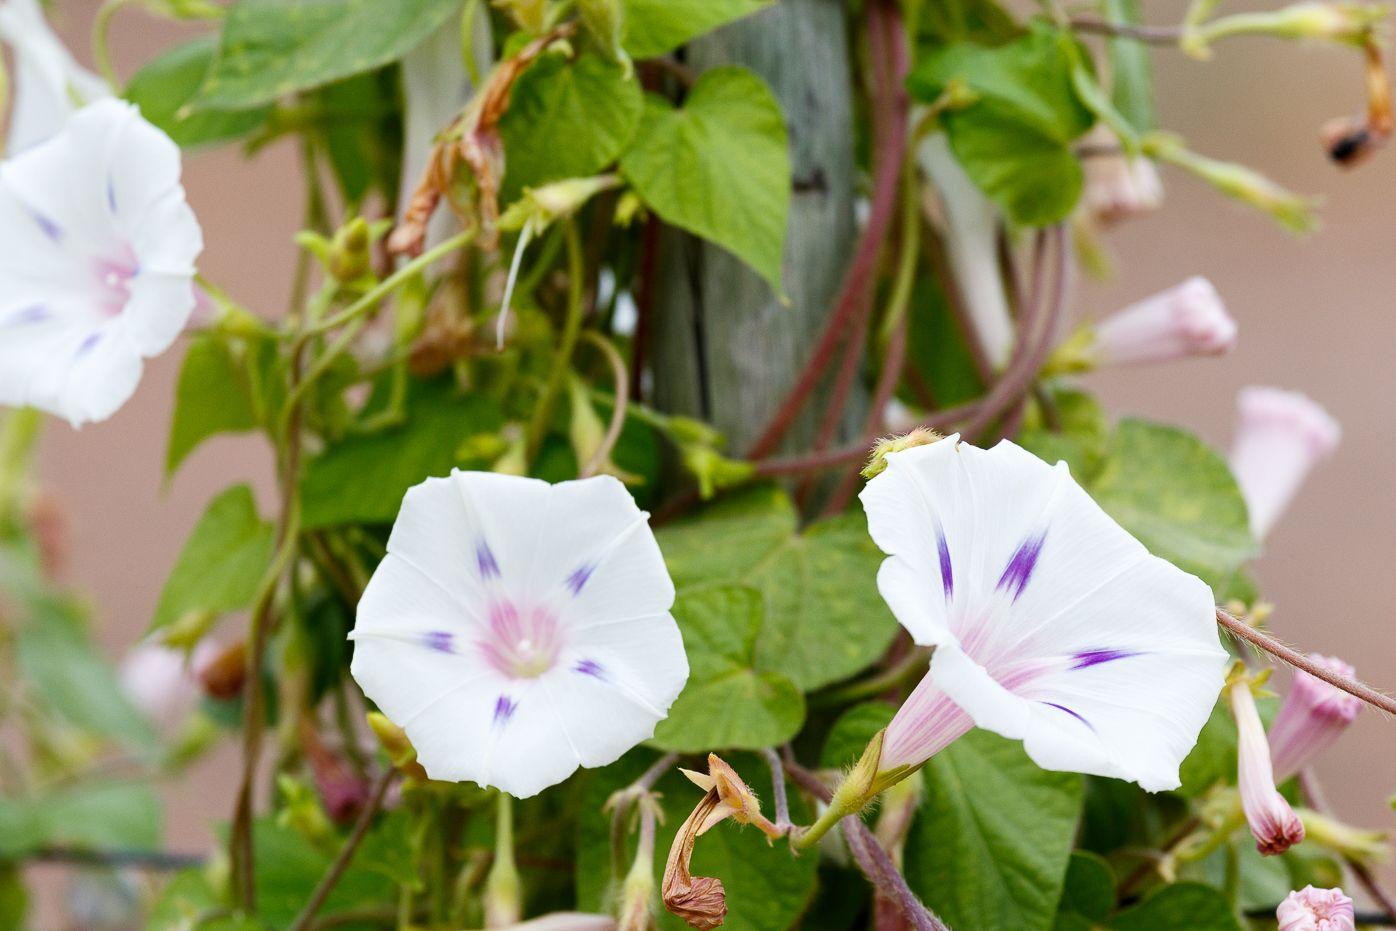 White Morning Glory Flowers Growing White Morning Glory Flowers